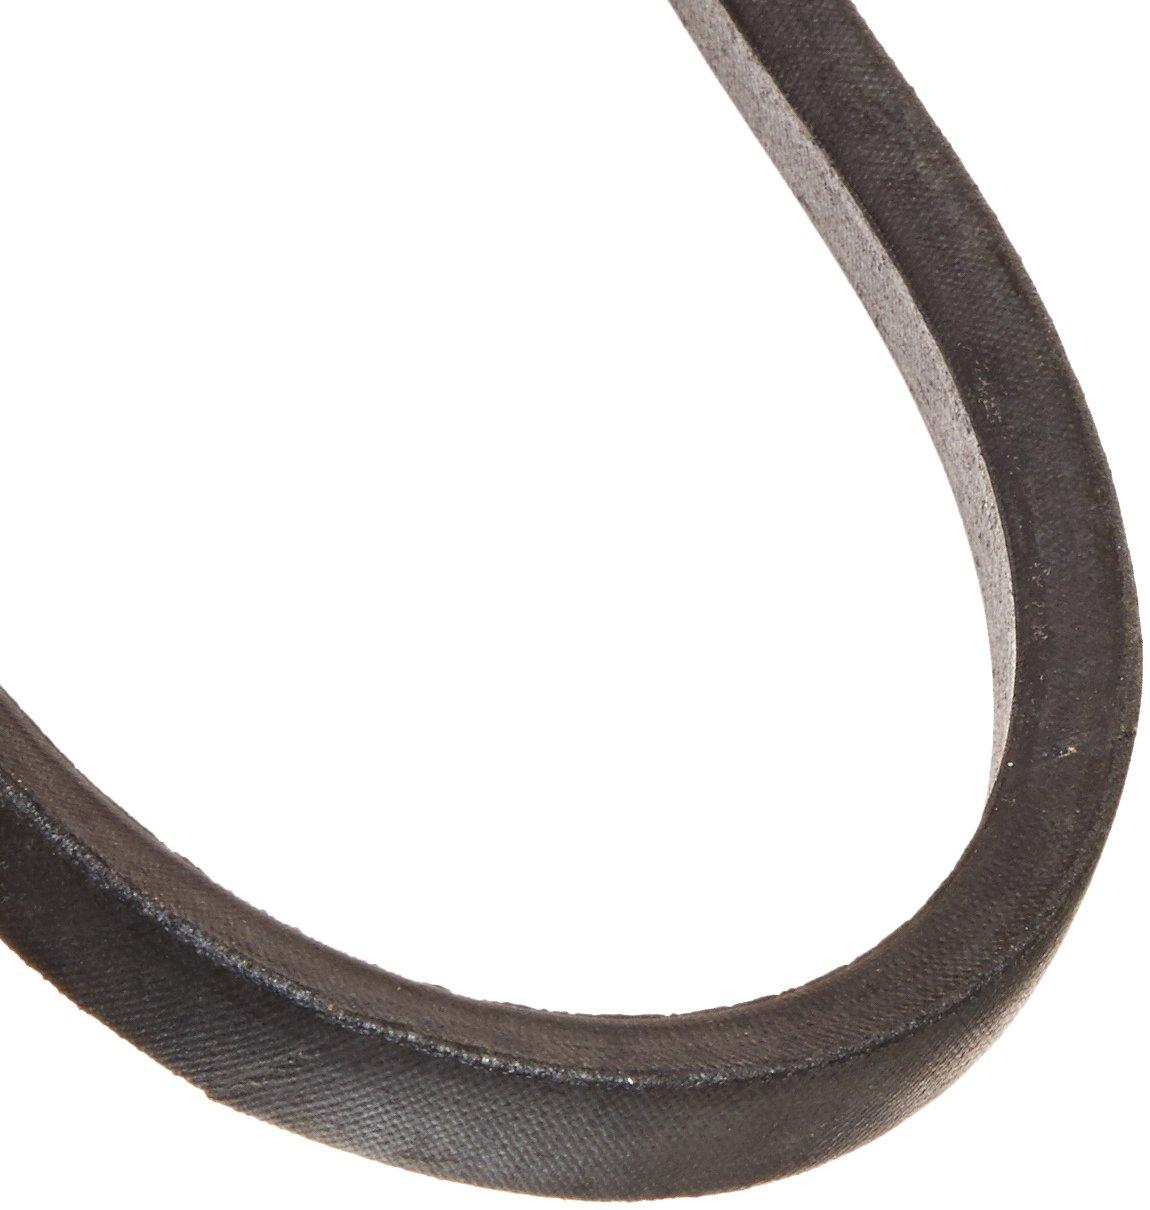 Gates A45 Hi-Power Belt